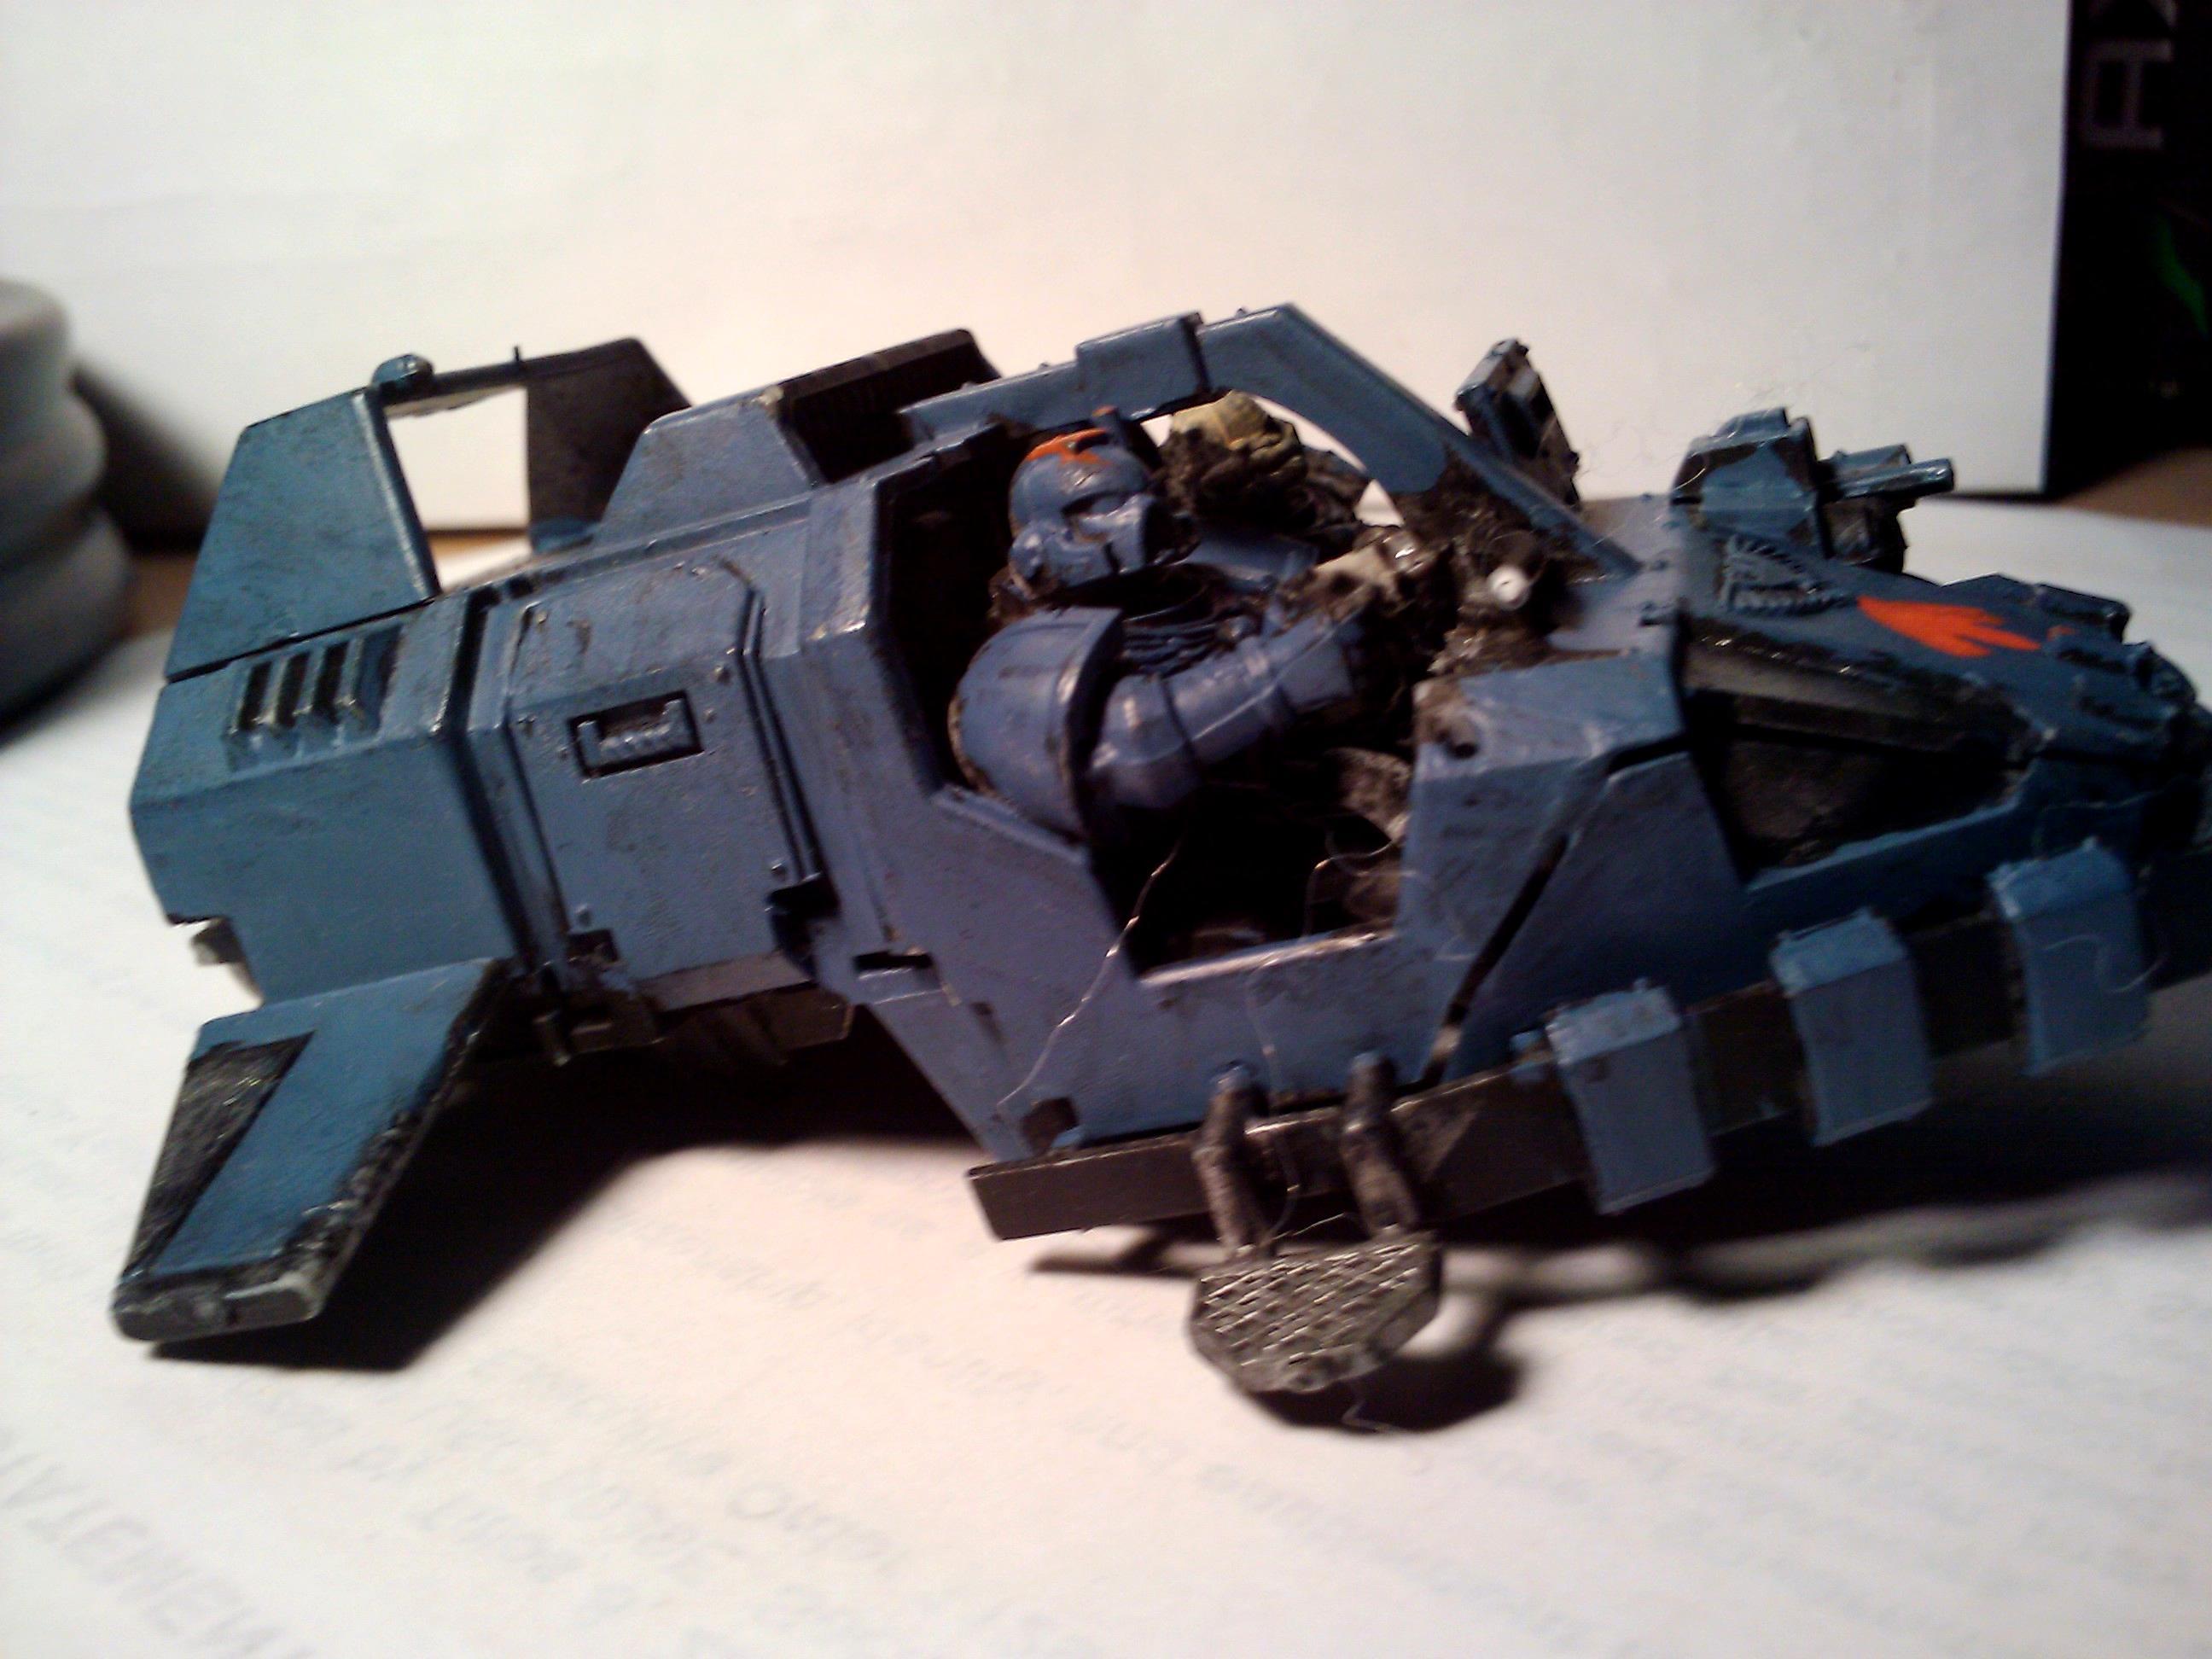 Conversion, Hobby, Kill Team, Land Speeder, Scenario, Space Marines, Space Wolves, Sw